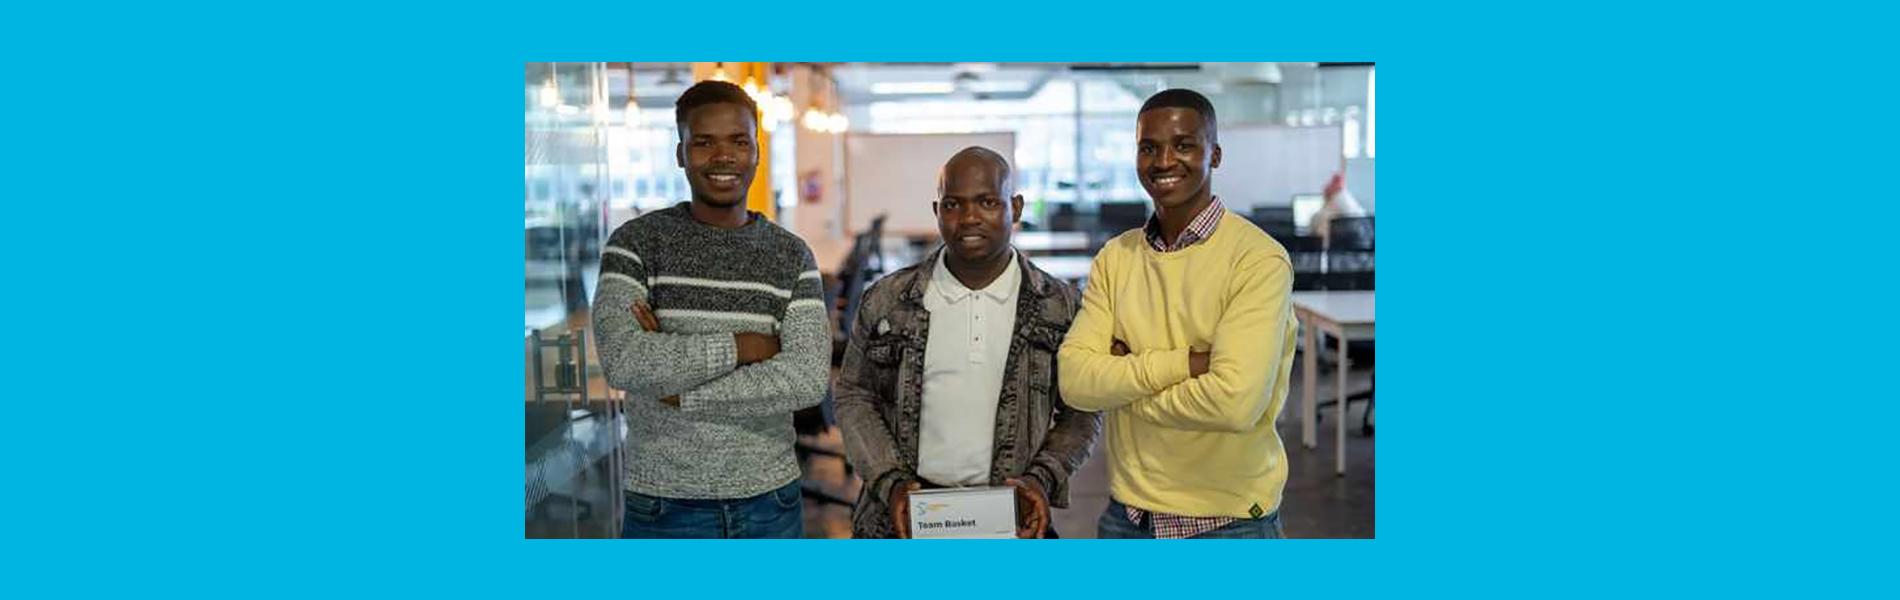 Student entrepreneurs set to launch app to help street vendors